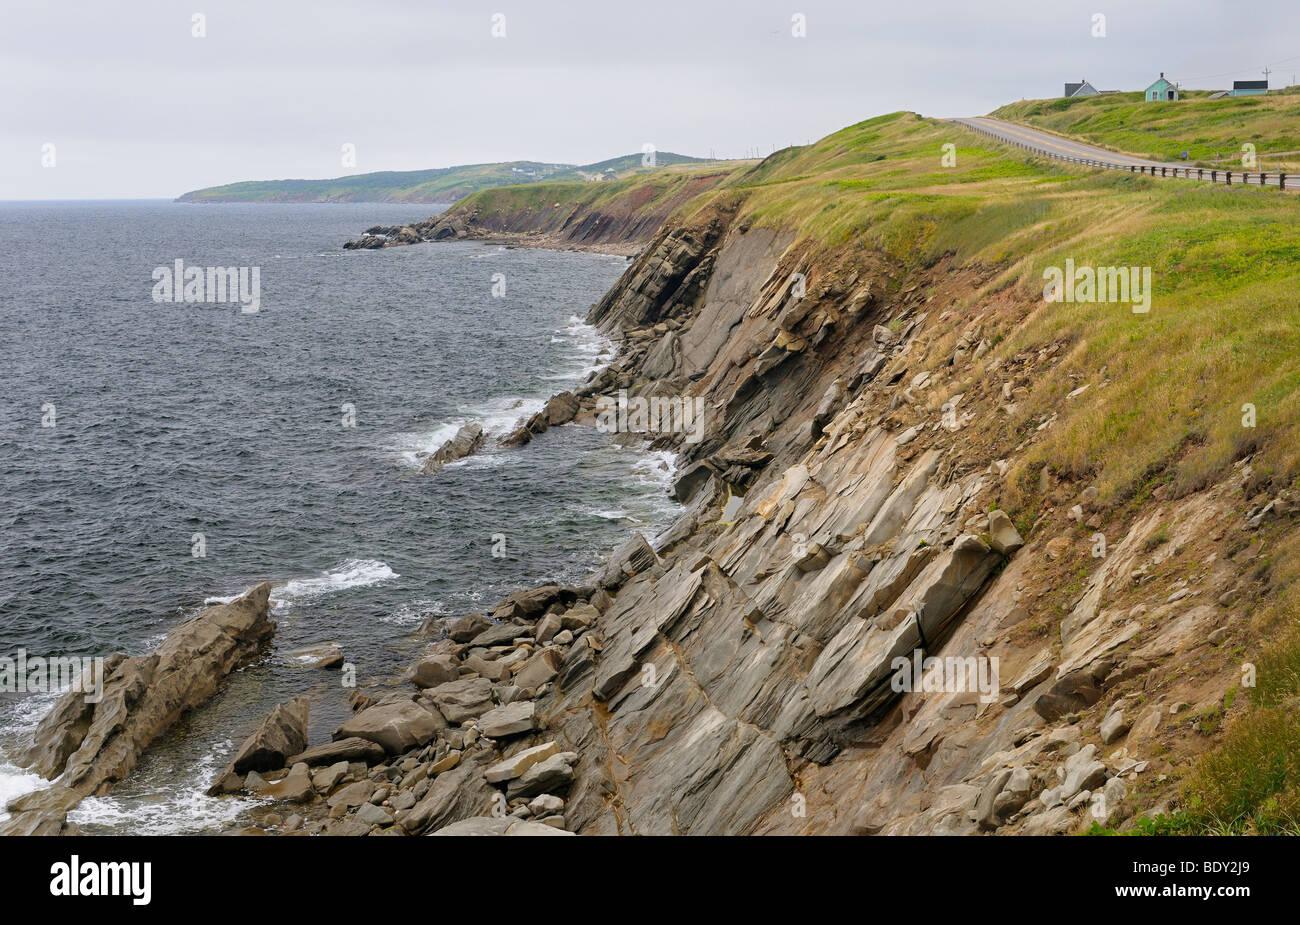 Coastal Cabot Trail road on the Gulf of St Lawrence Cape Breton Island Nova Scotia - Stock Image